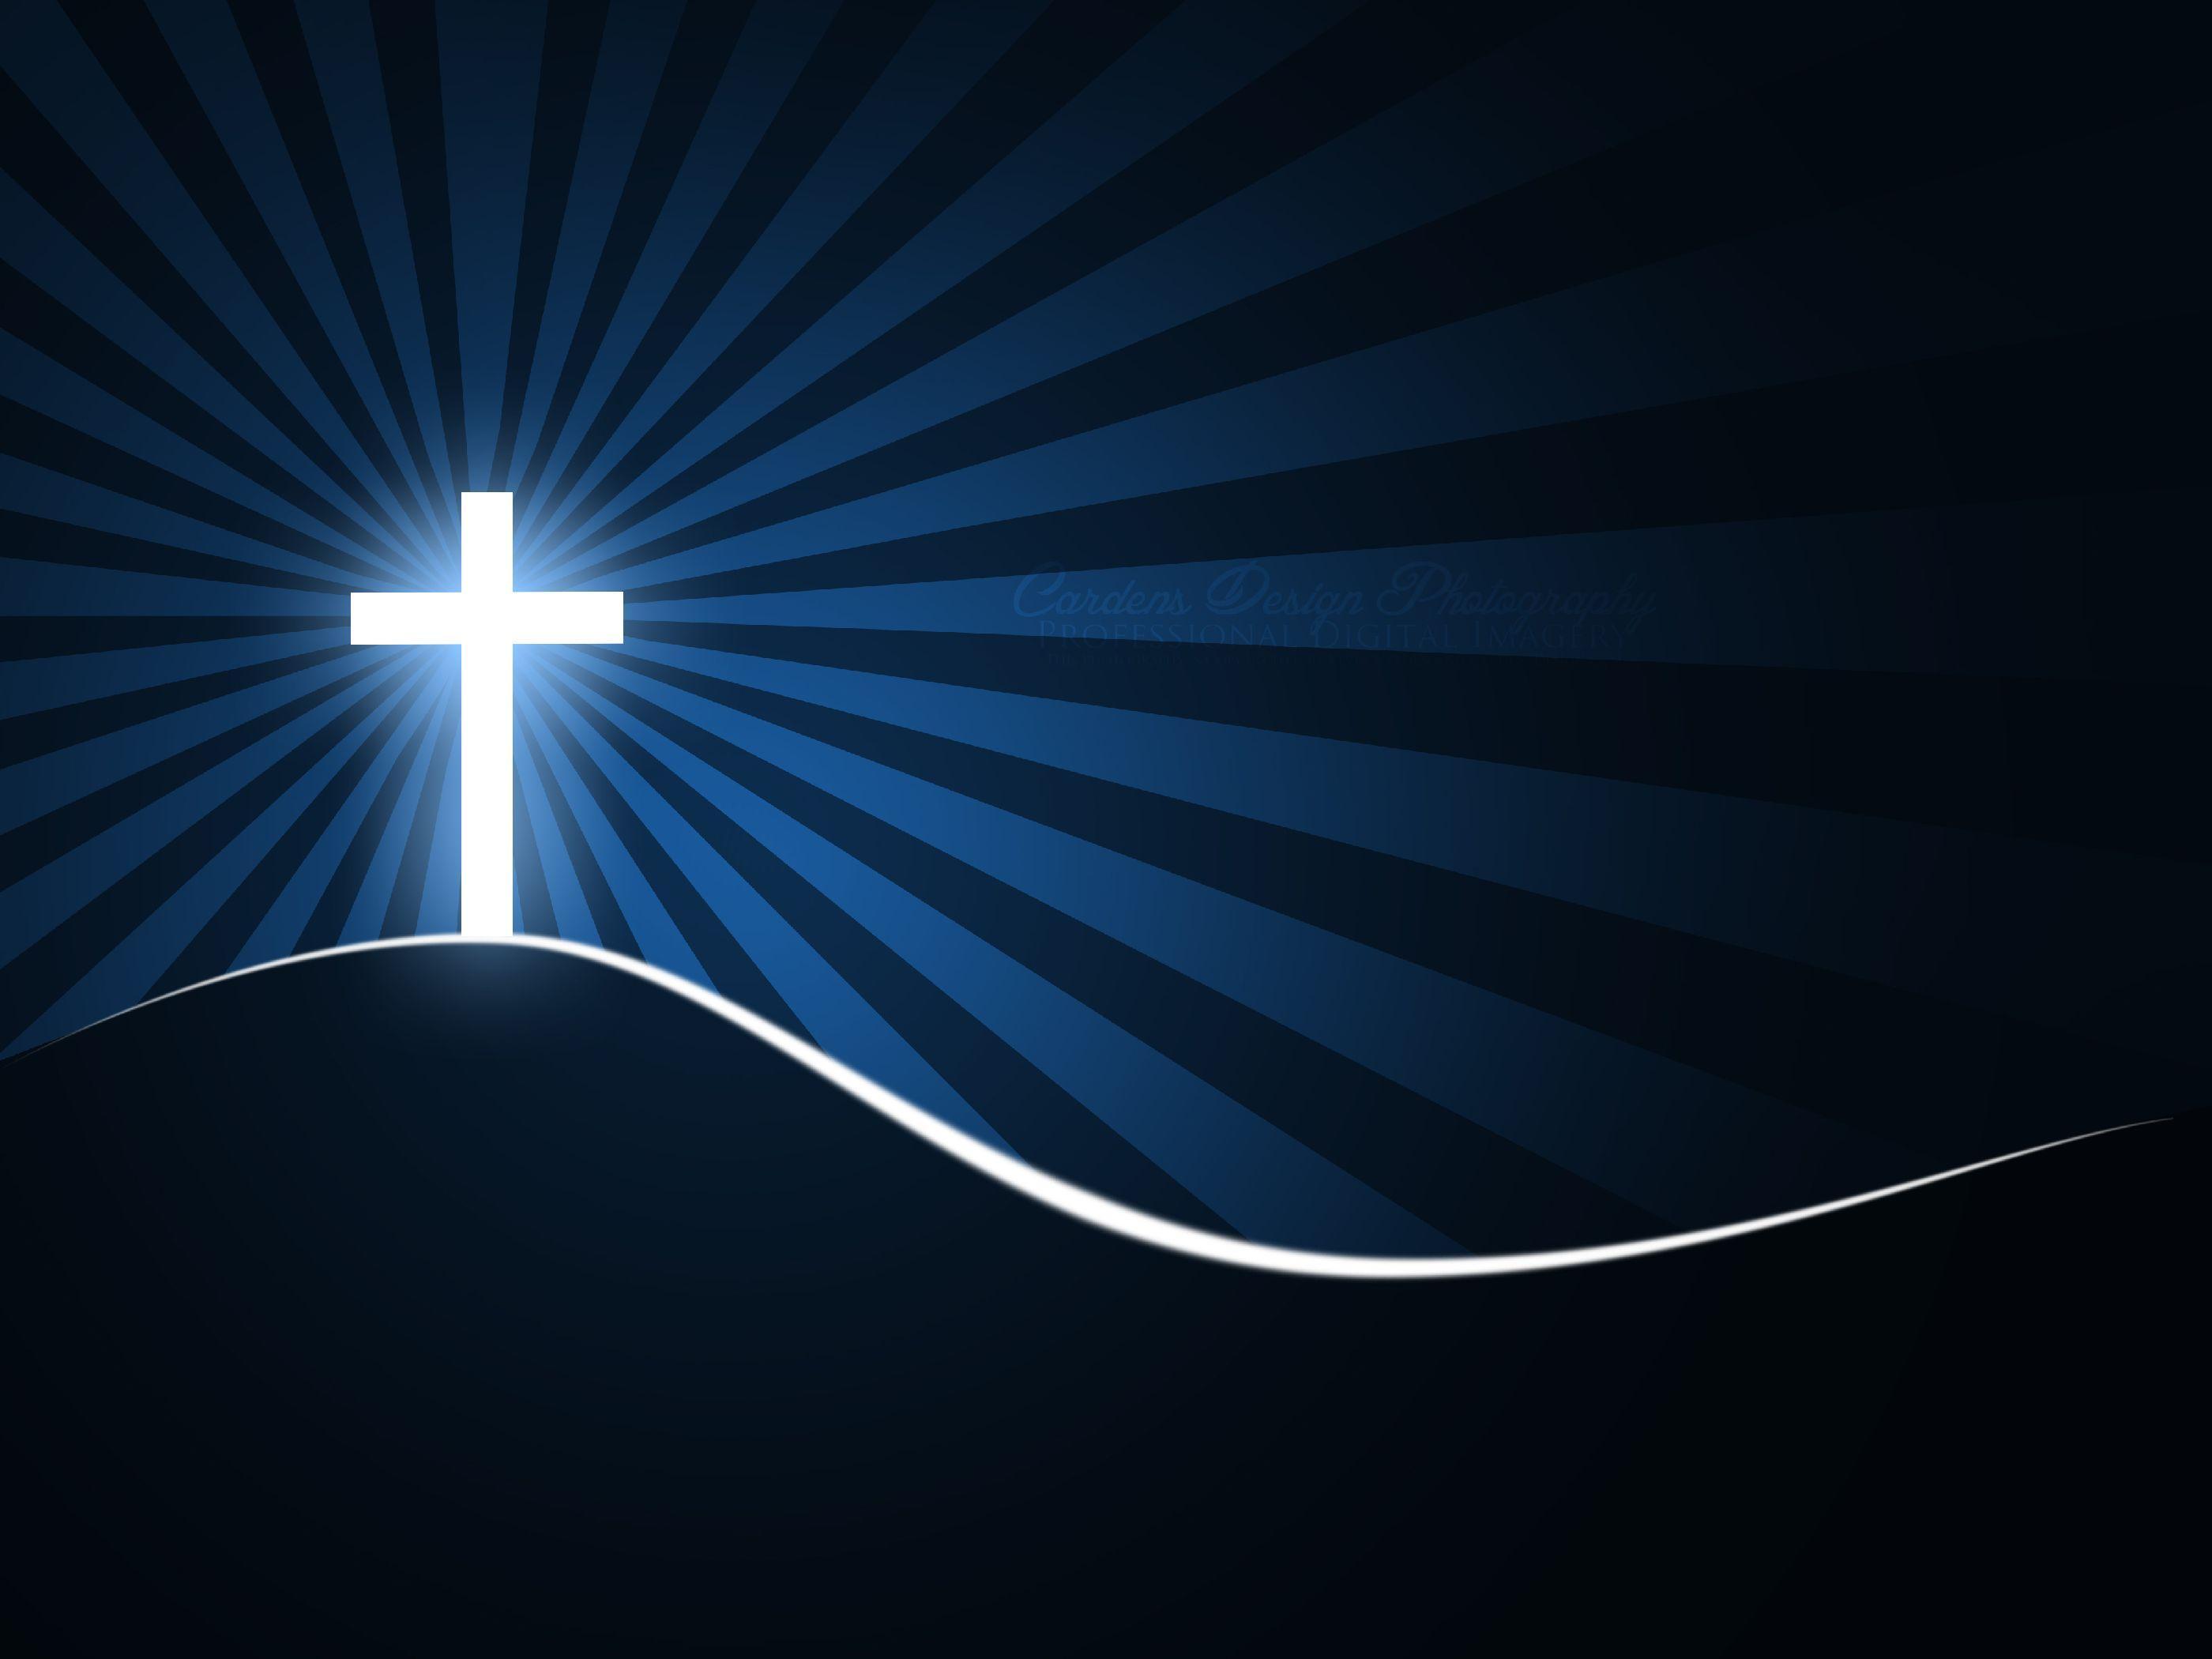 Christian Cross Wallpapers 2800x2100